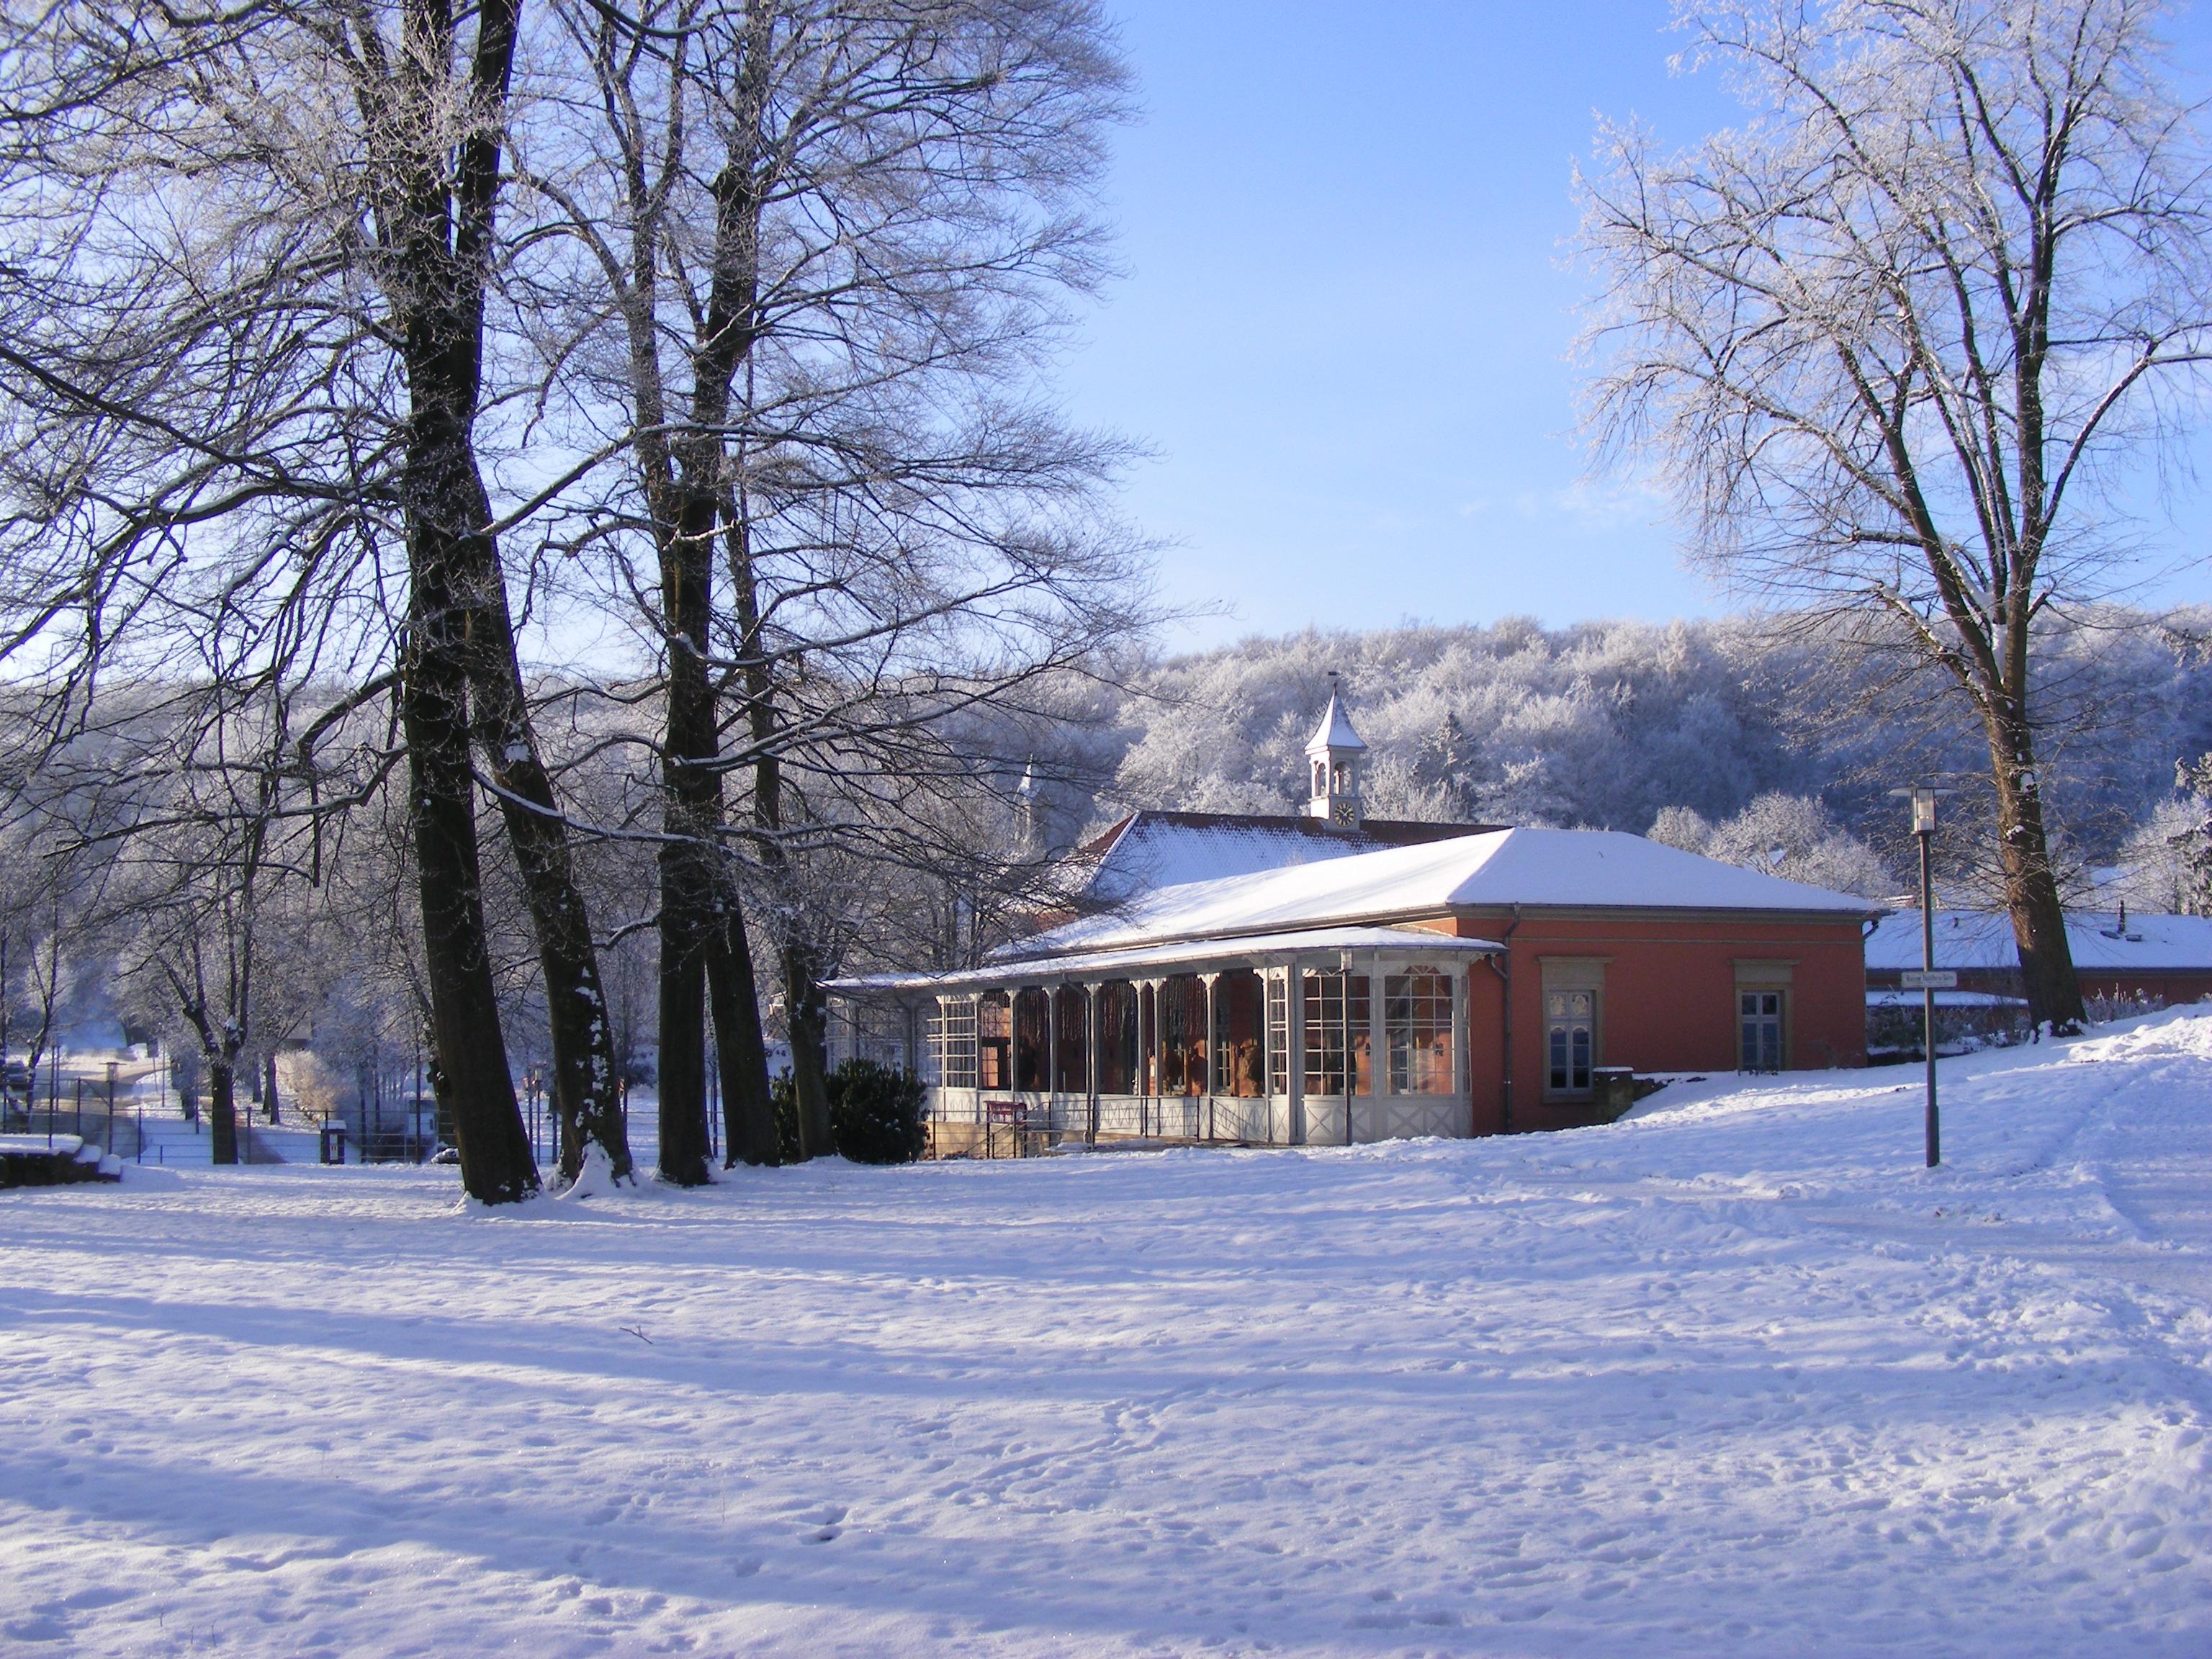 Winterbild Romantik Bad Rehburg